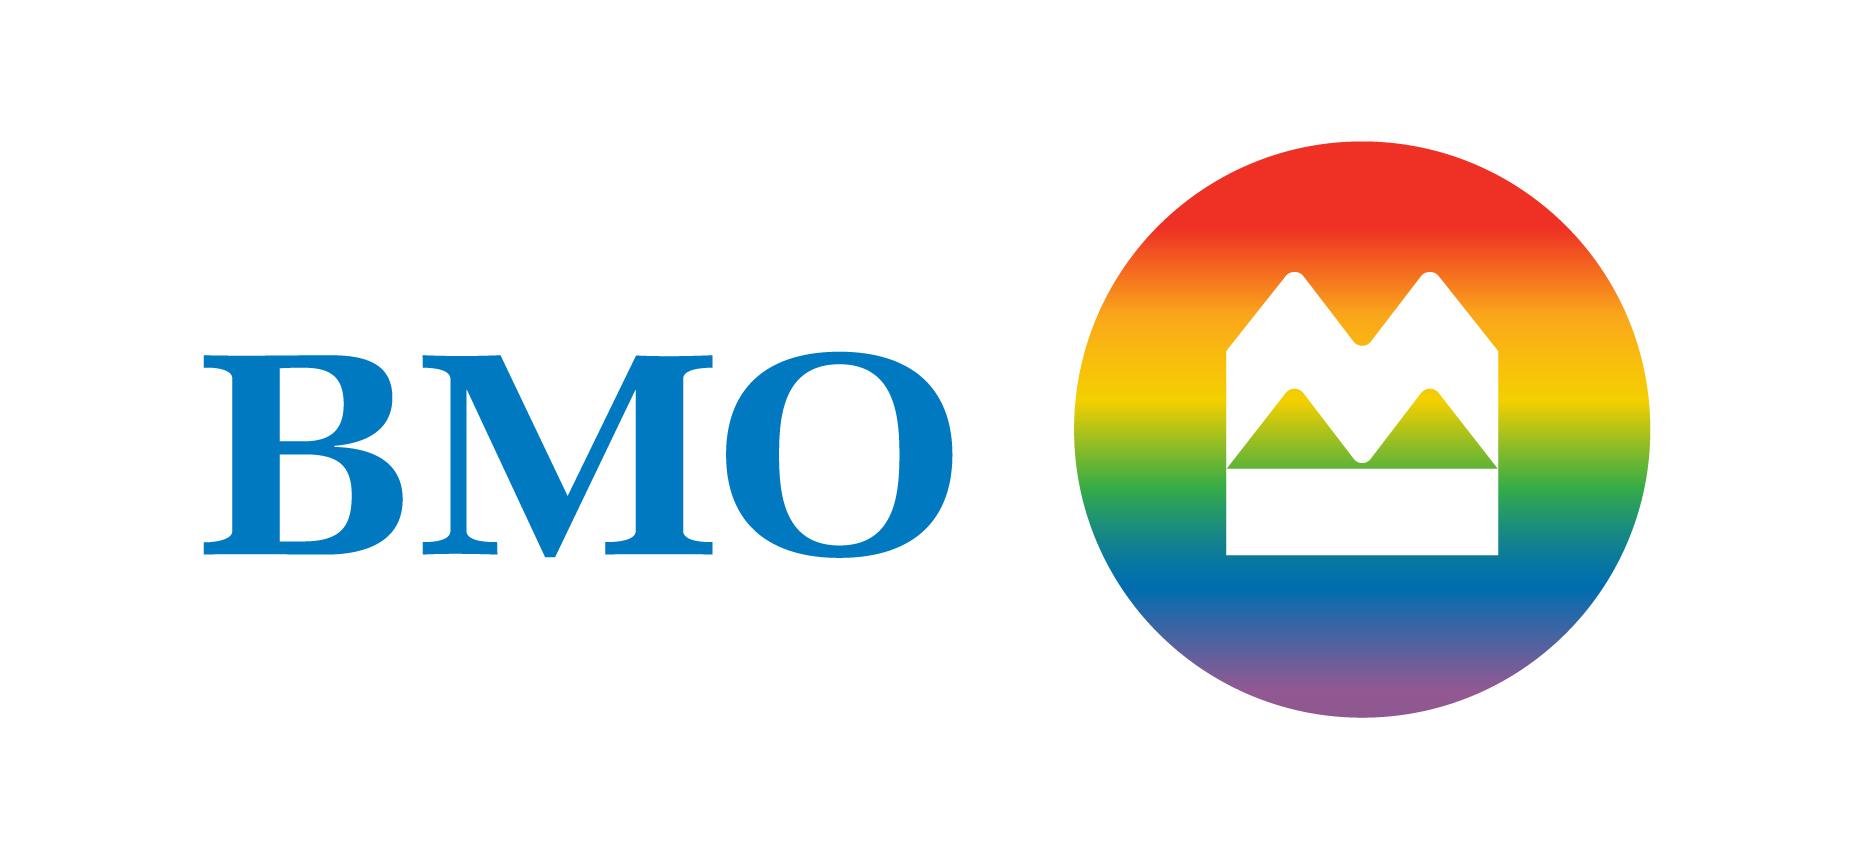 BMO_MasterBrand_Pride_2.jpg